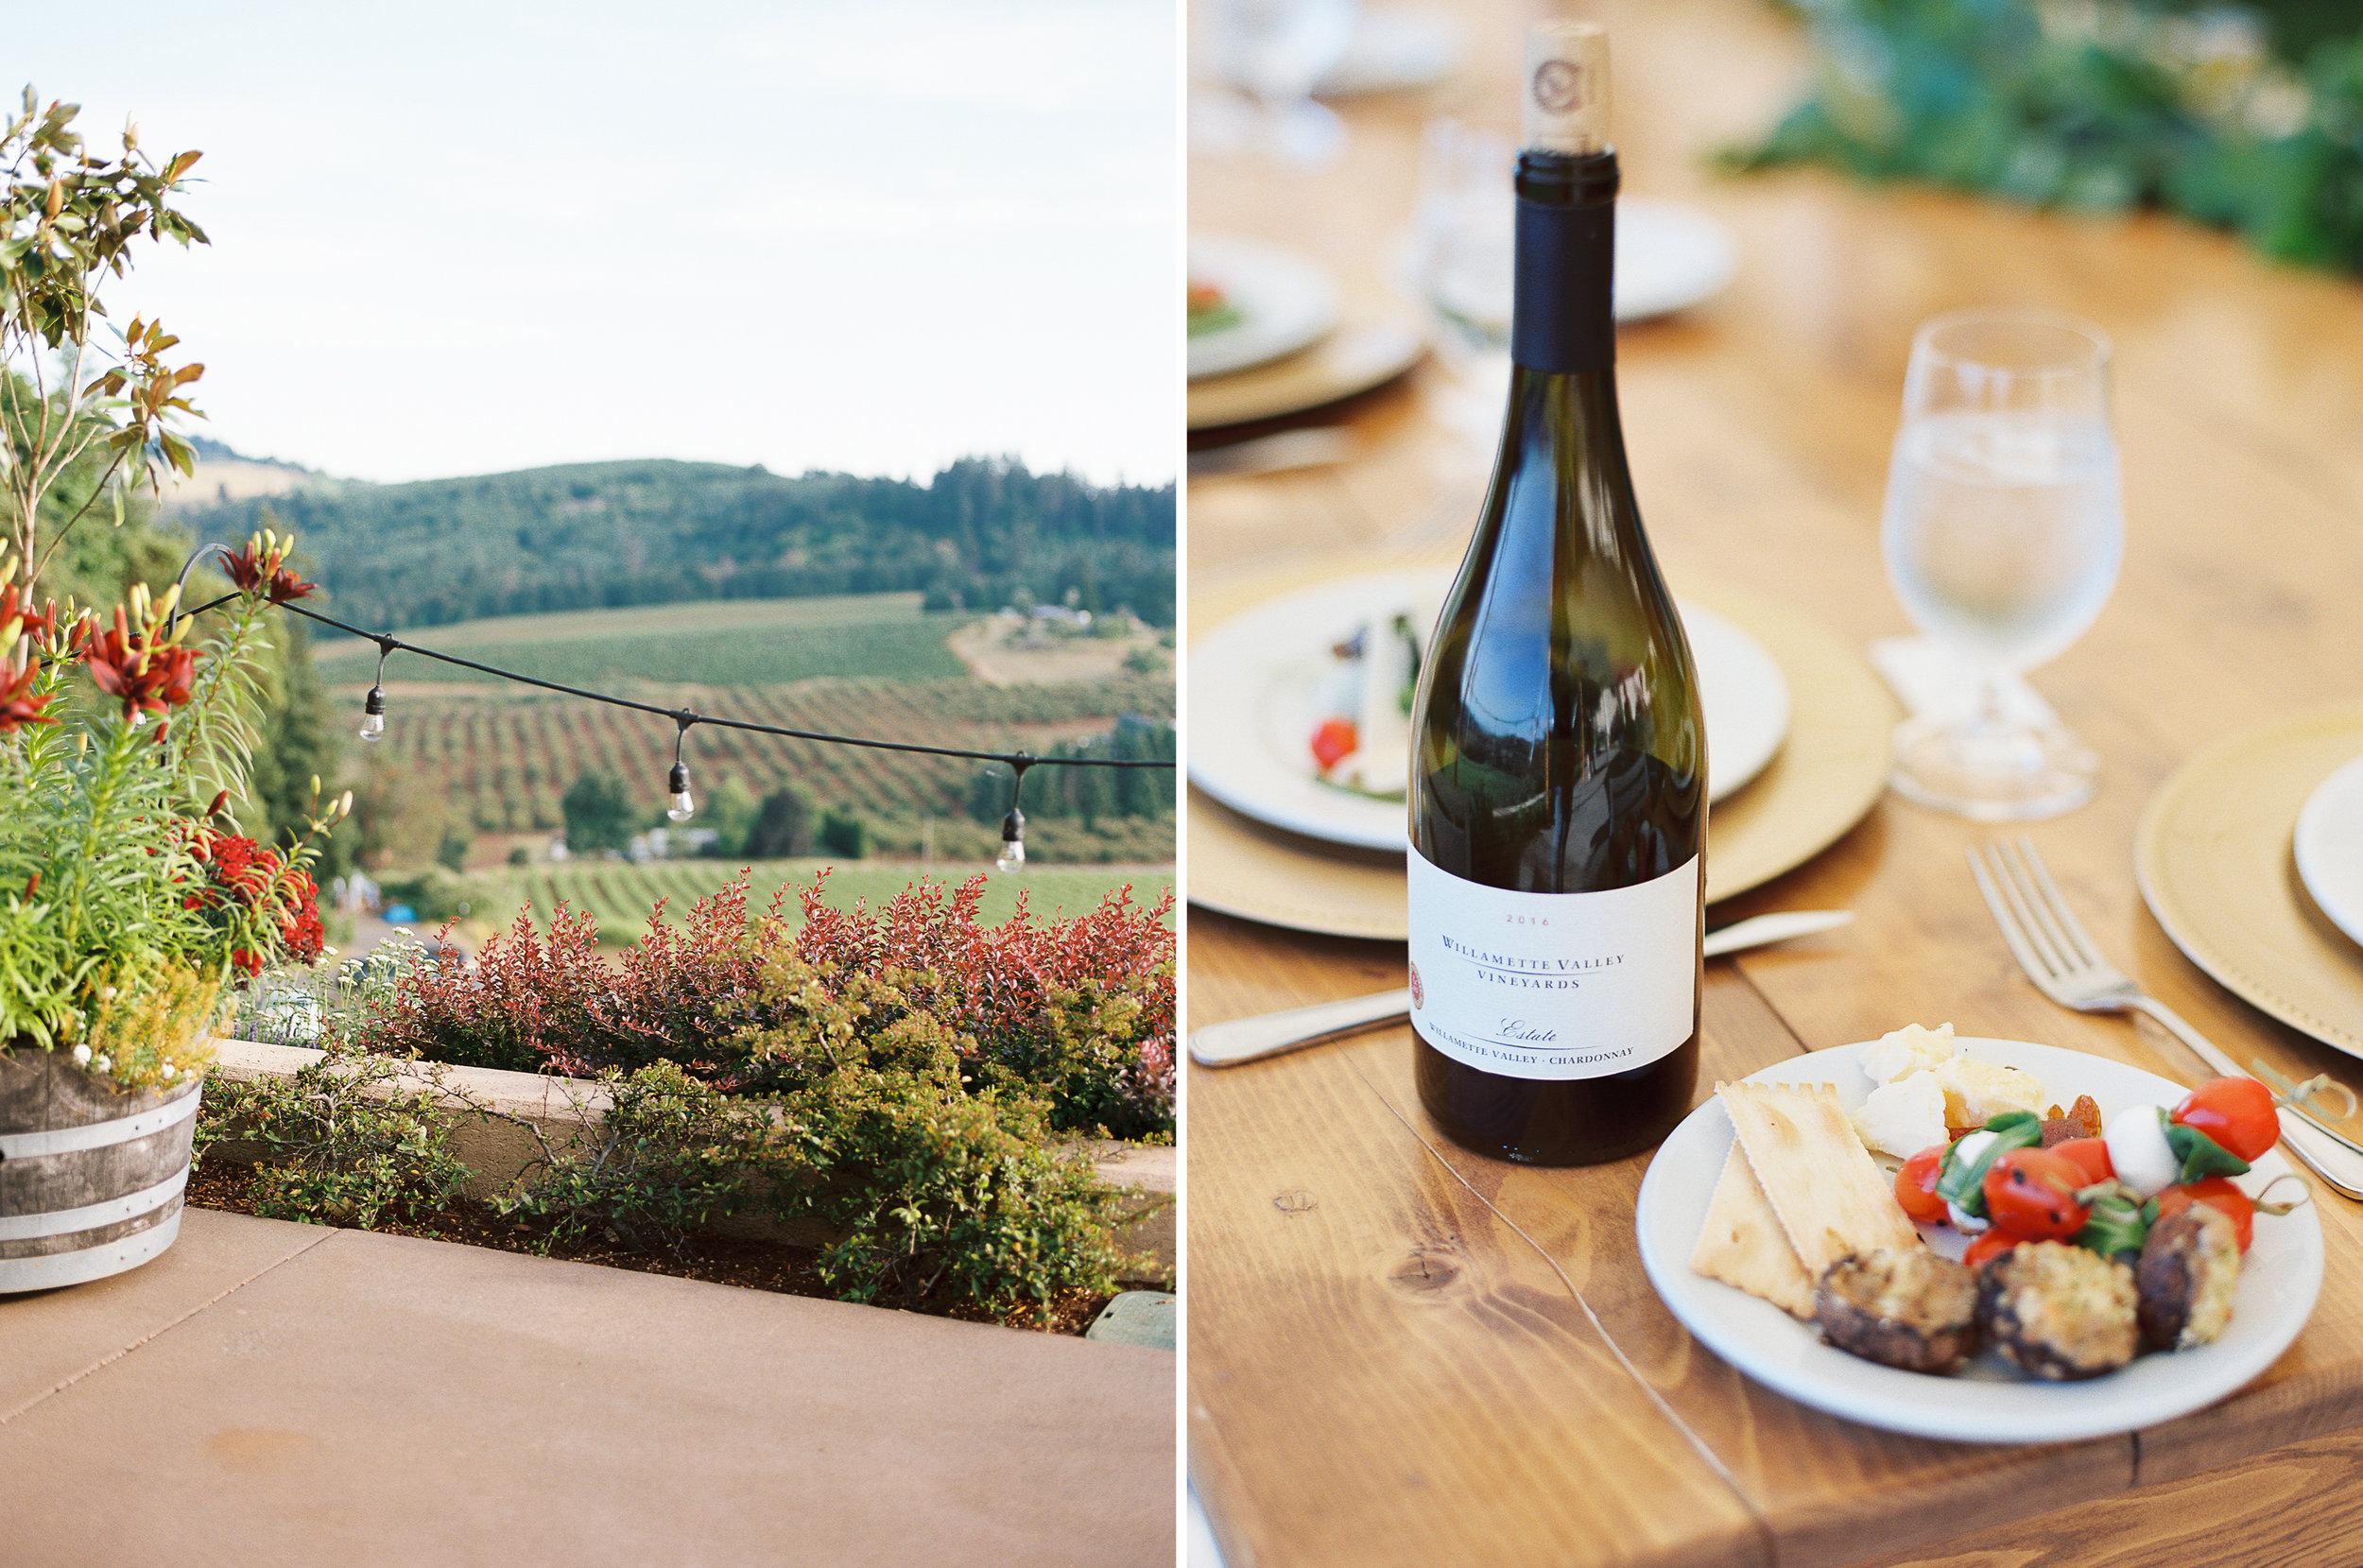 romantic-willamette-valley-vineyard-wedding-16.jpg